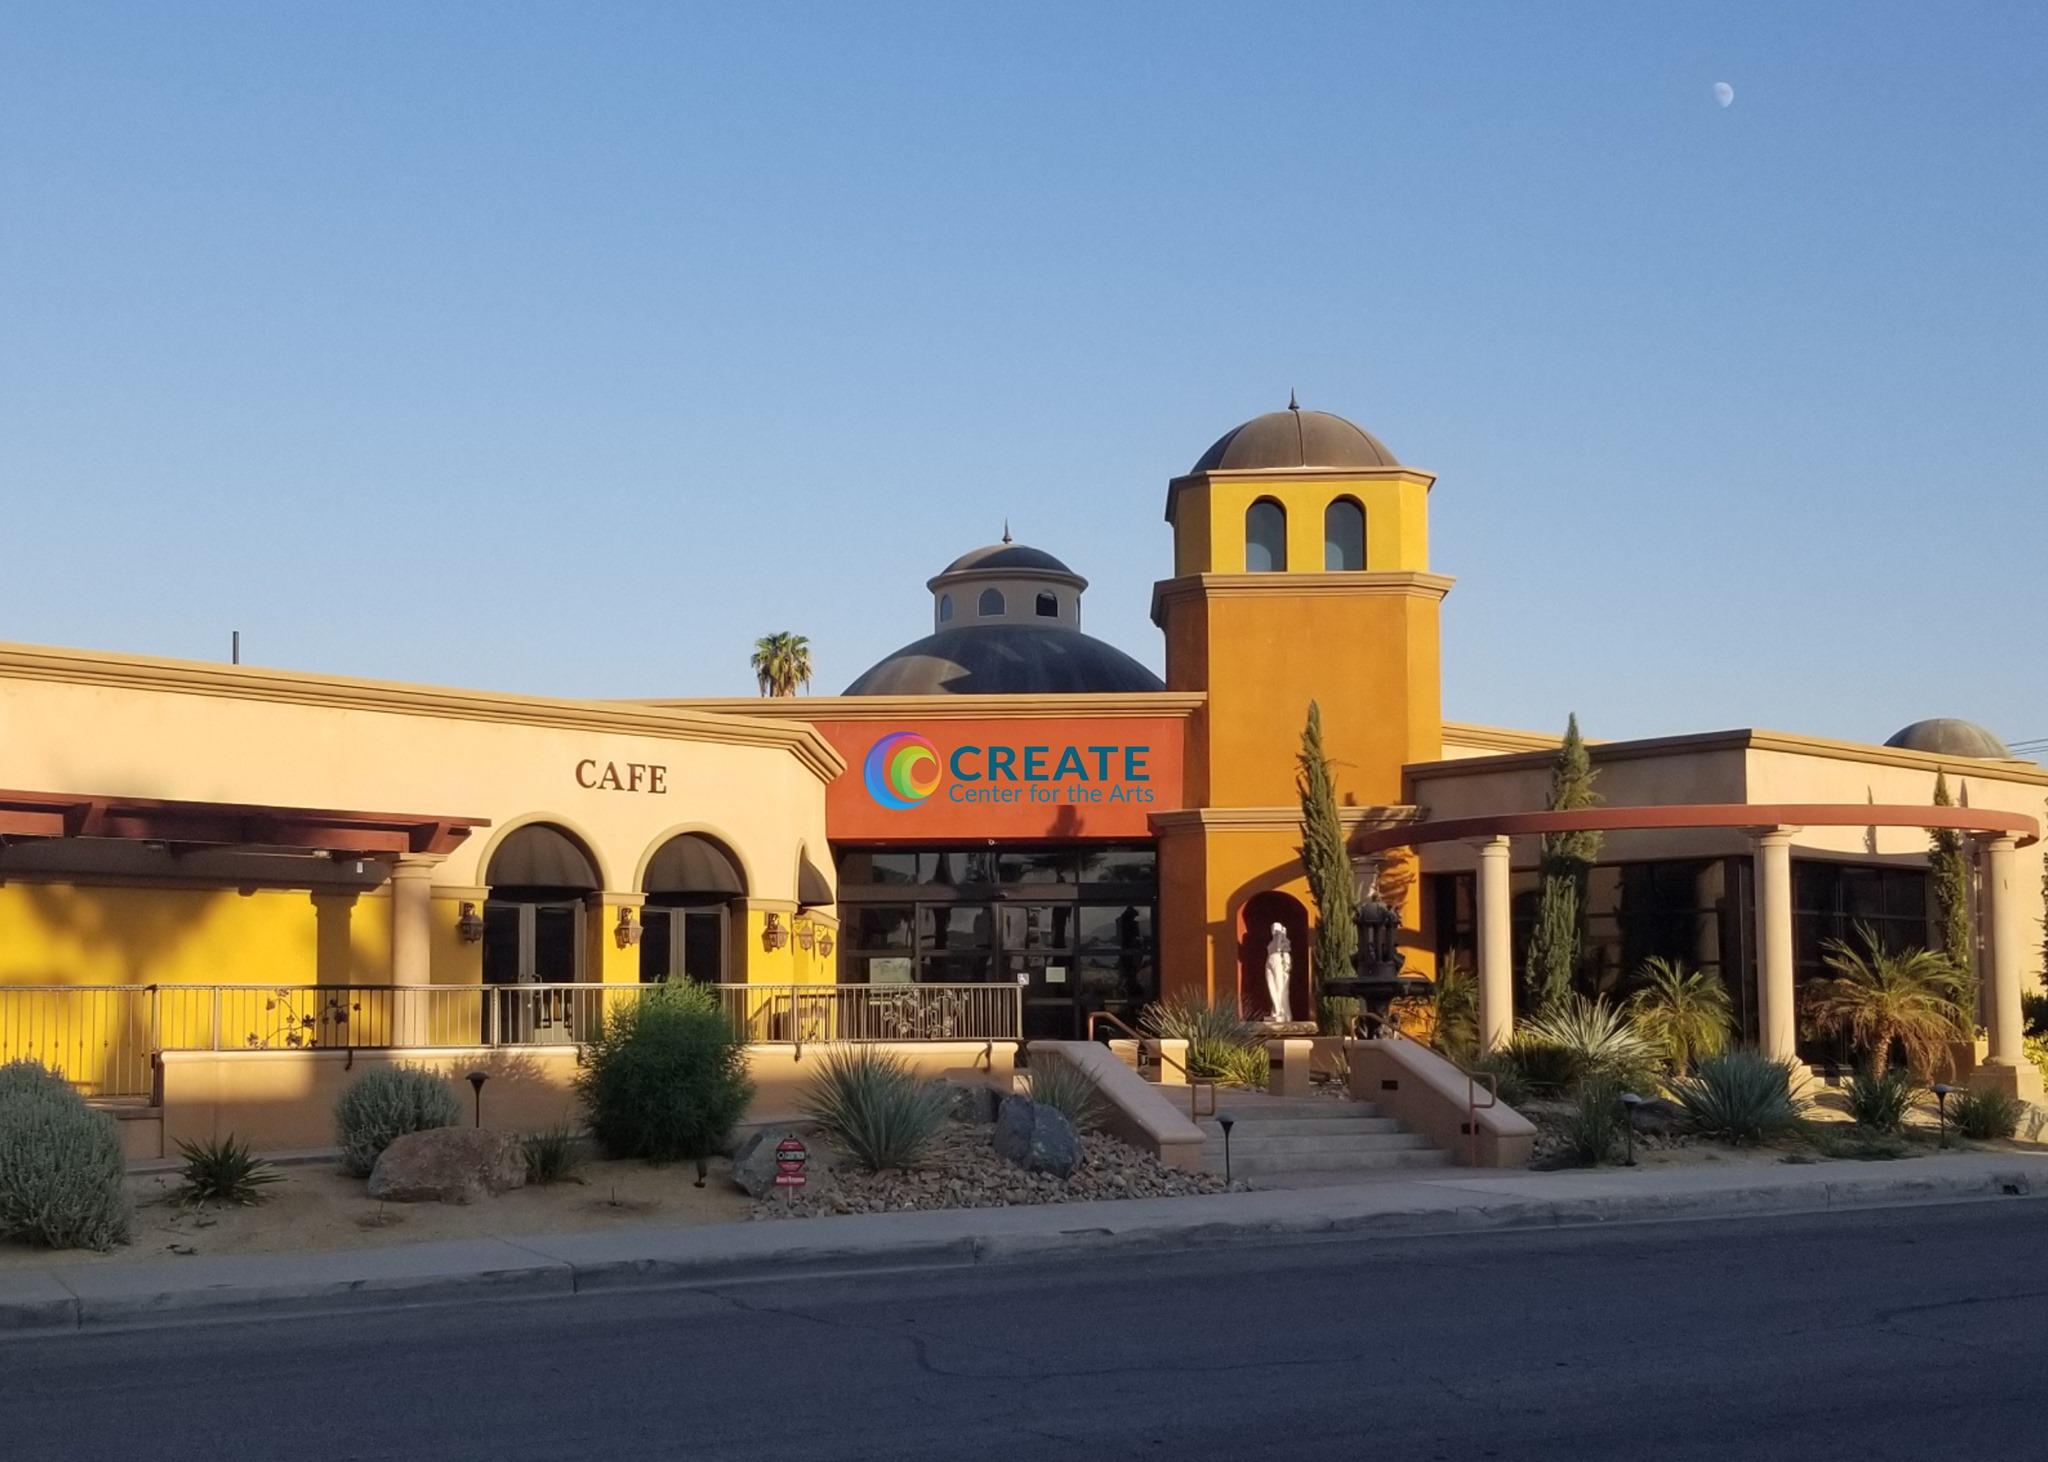 CREATE Center